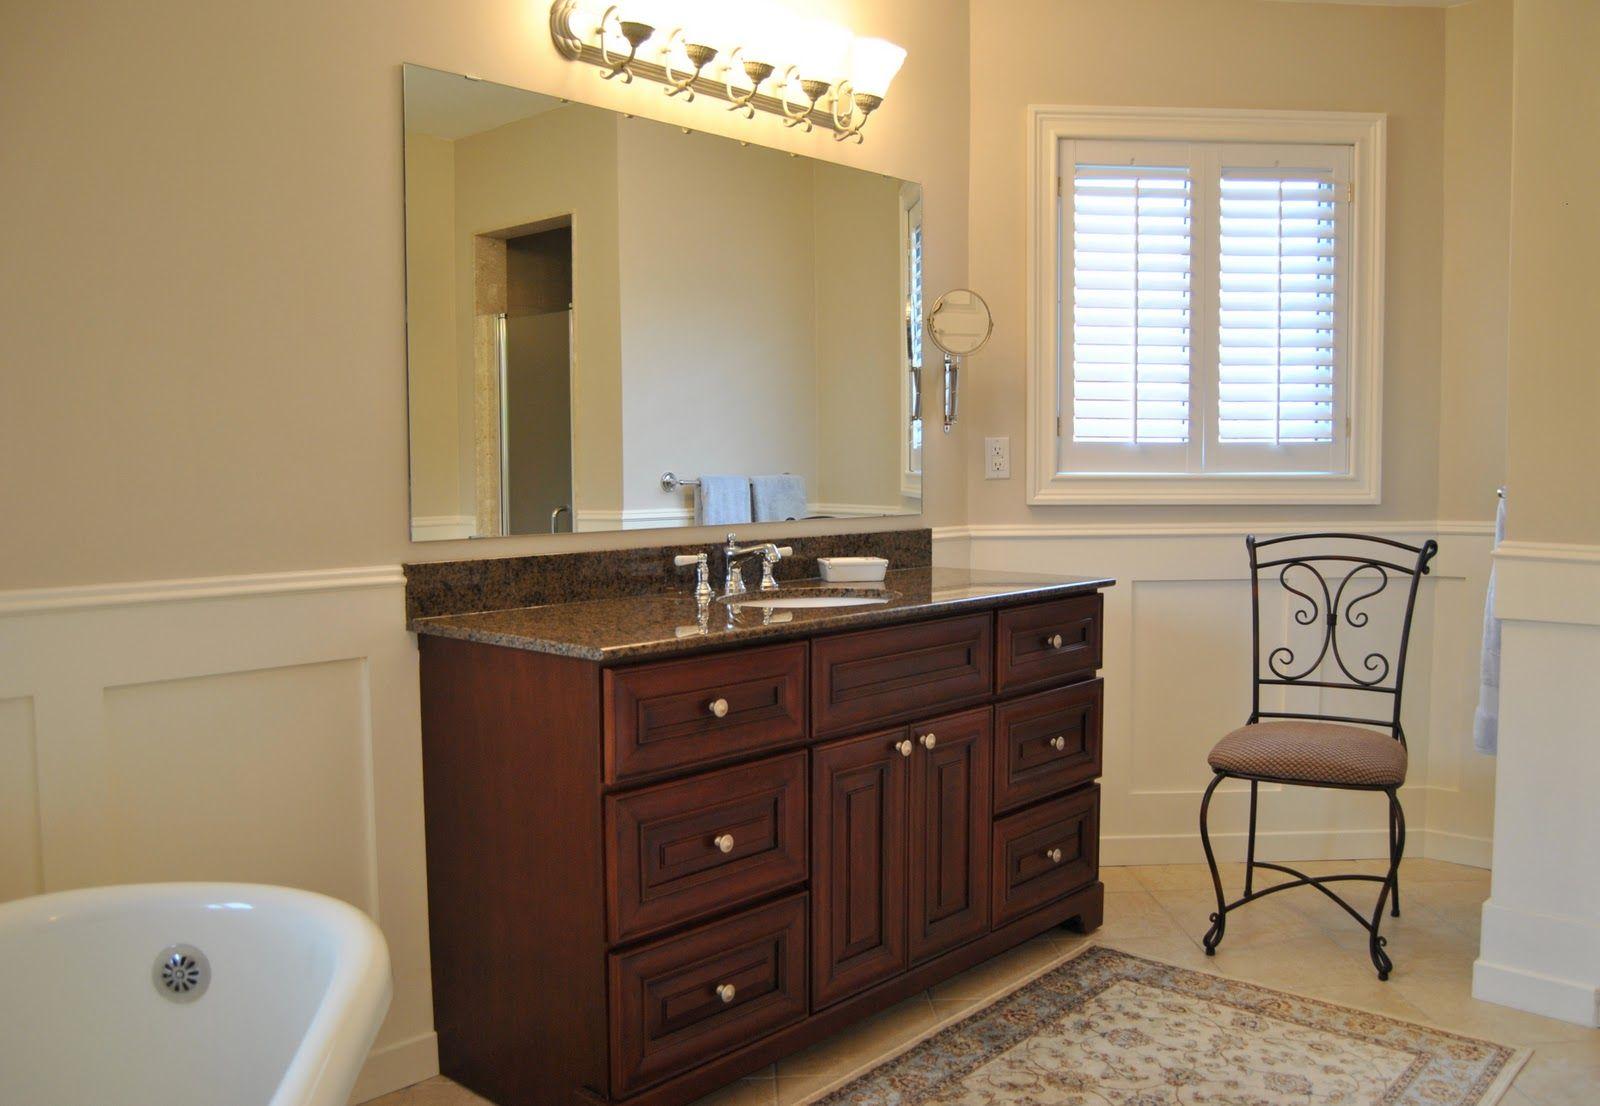 Wainscoting bathroom design trim work shaker style and wainscoting